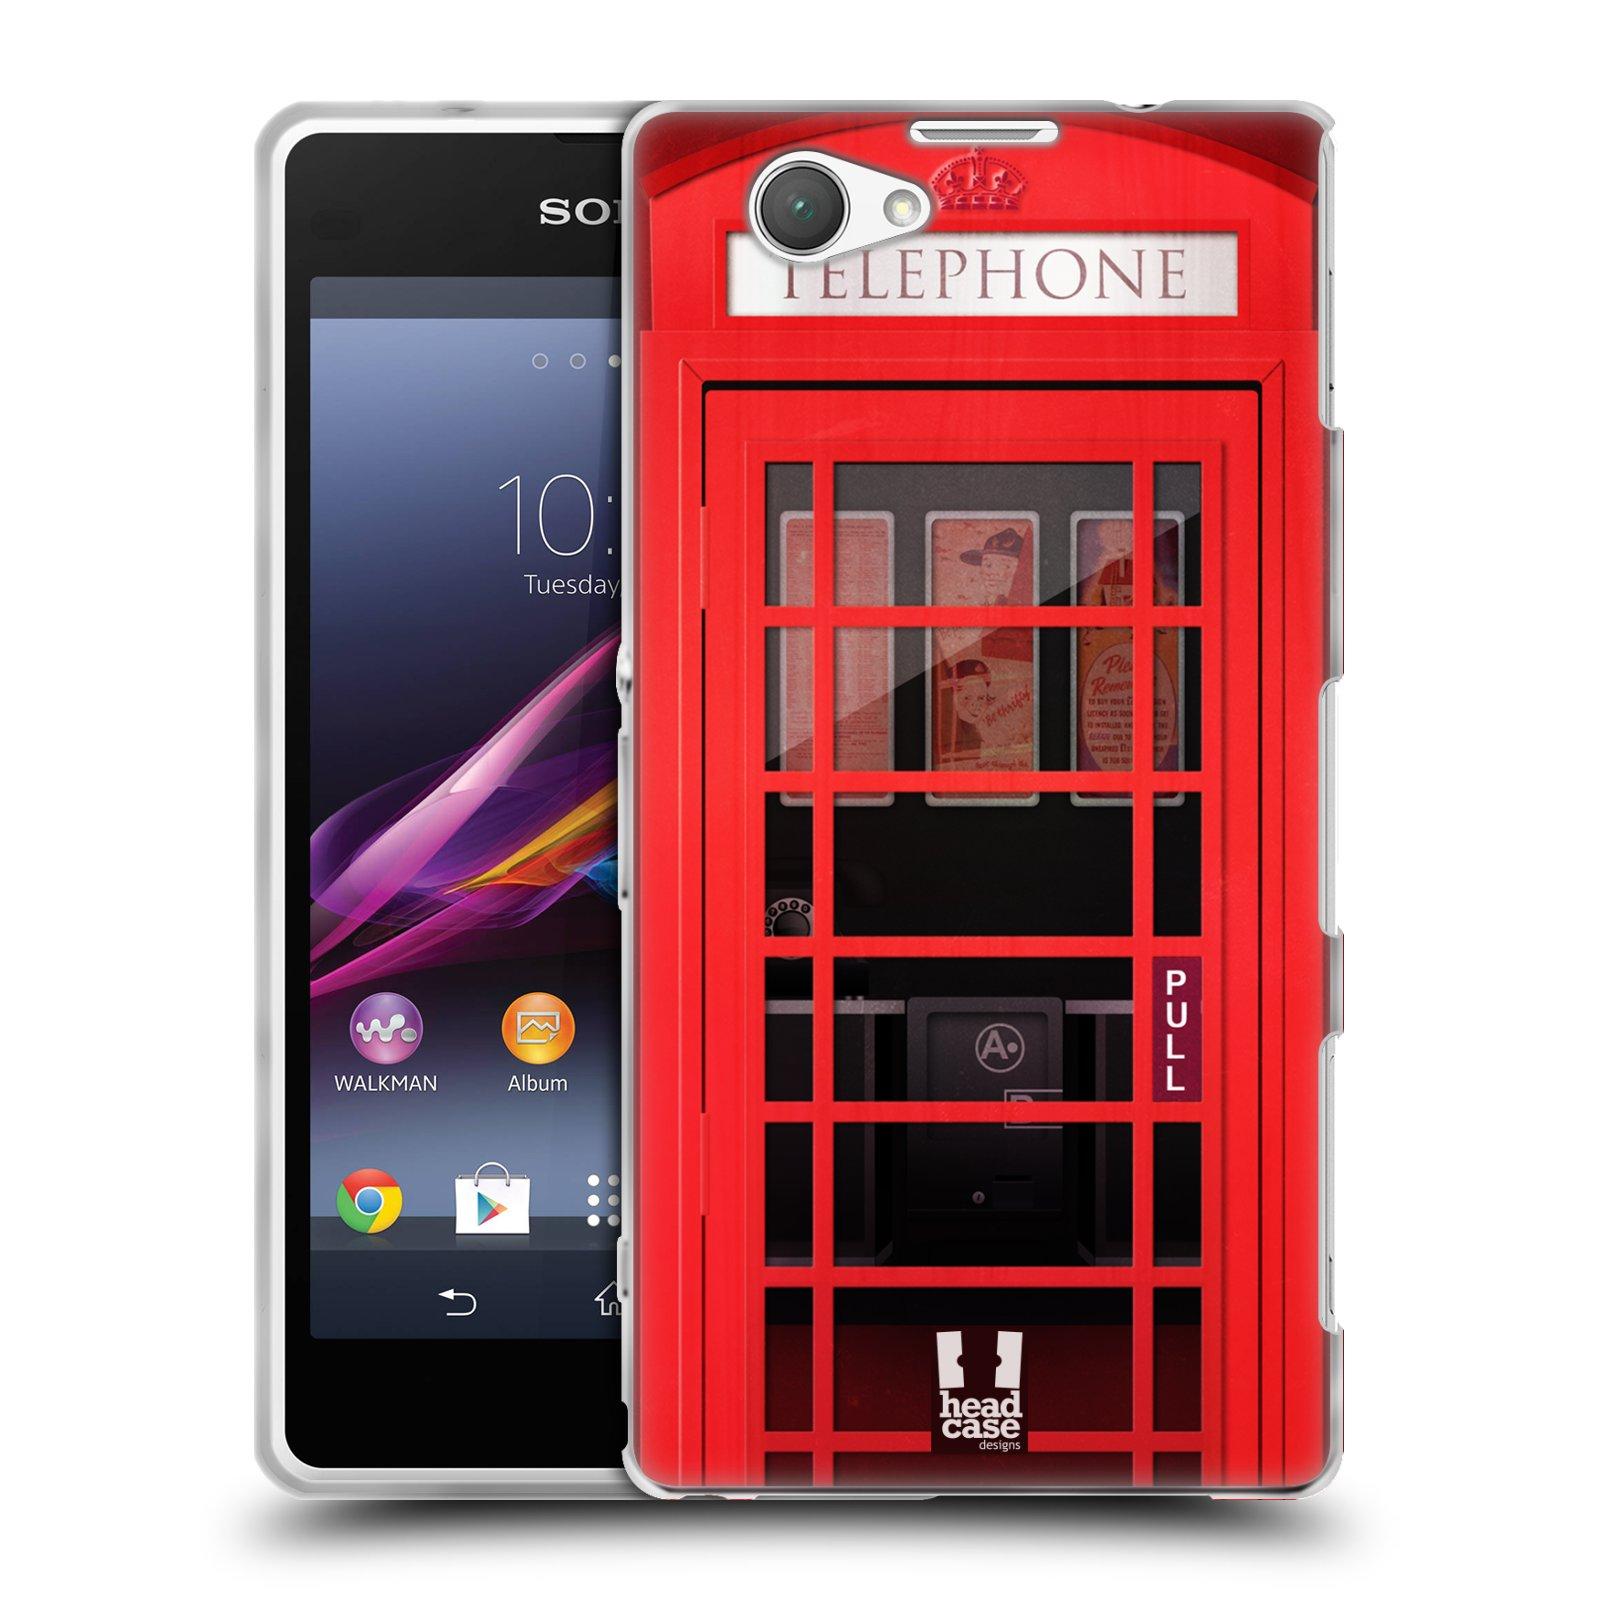 Silikonové pouzdro na mobil Sony Xperia Z1 Compact D5503 HEAD CASE TELEFONNÍ BUDKA